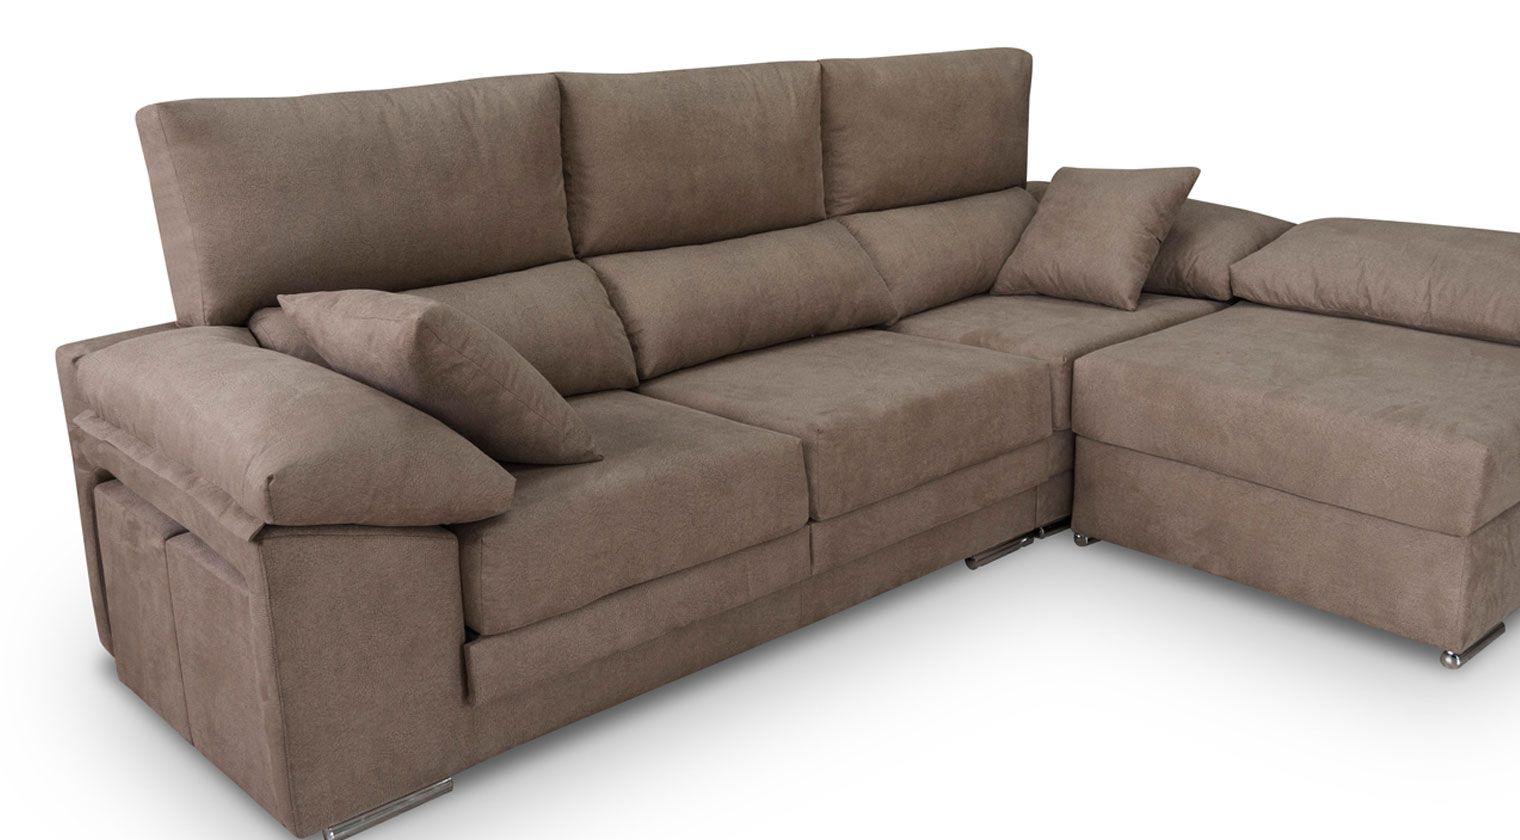 Comprar chaise longue kibo chaise longue 4 plazas tela ilinois for Sofa extensible 4 plazas